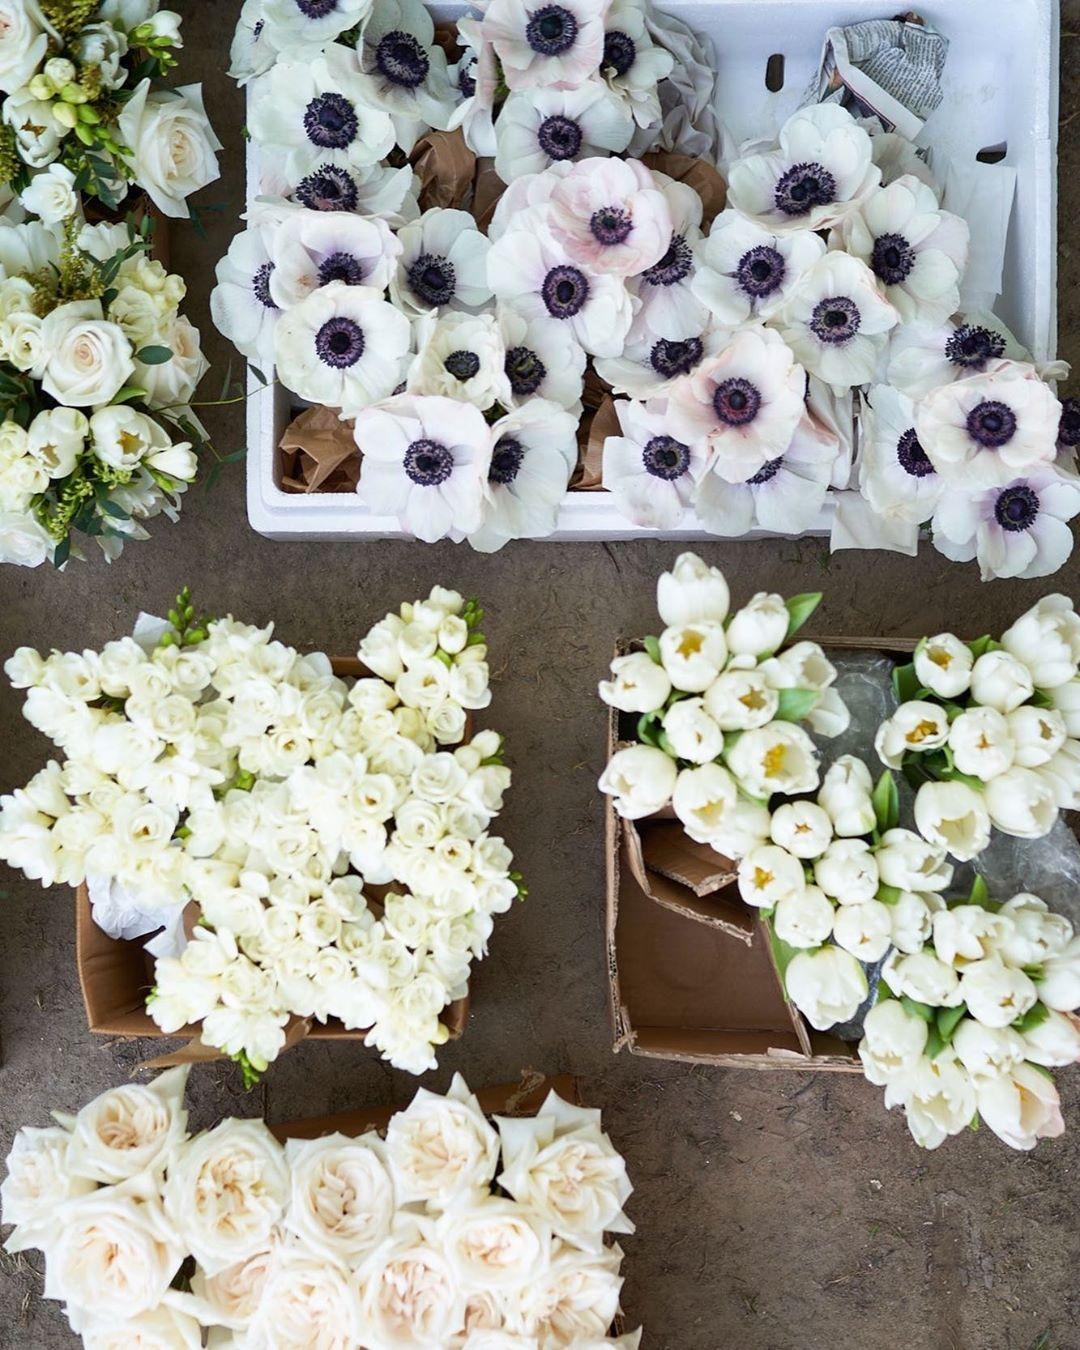 Singapore Flower Bahrain On Instagram Dear Anemones How We Miss Thee Matttakespictures1 Anedenaffair Floraldesign Seasonal Flowers Anemone Flowers